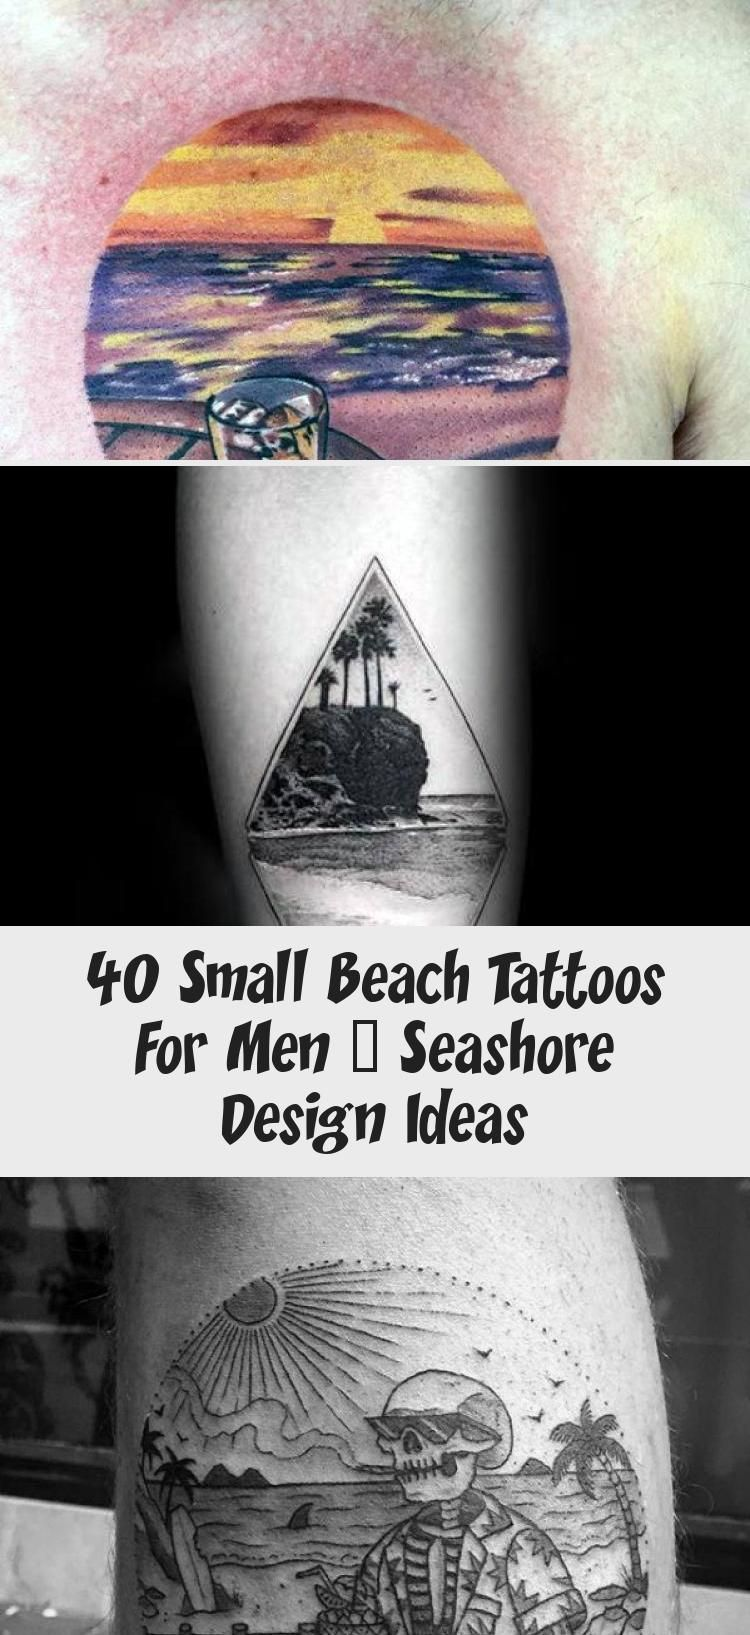 20 Small Beach Tattoos For Men – Seashore Design Ideas   Tattoo ...